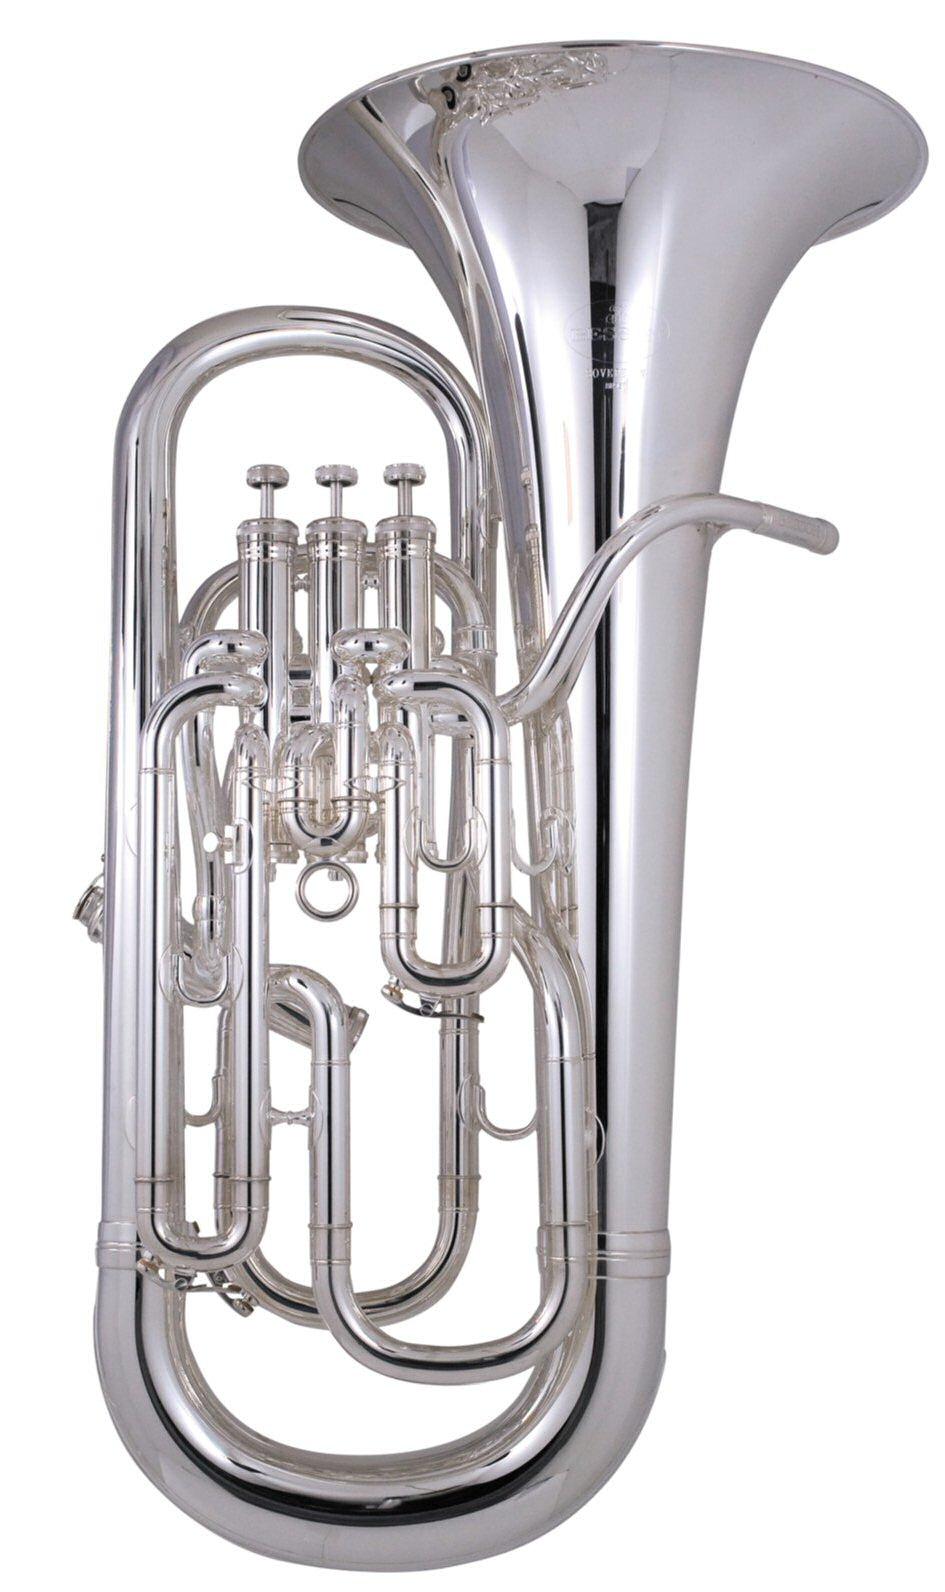 Besson BE968 Sovereign Euphonium